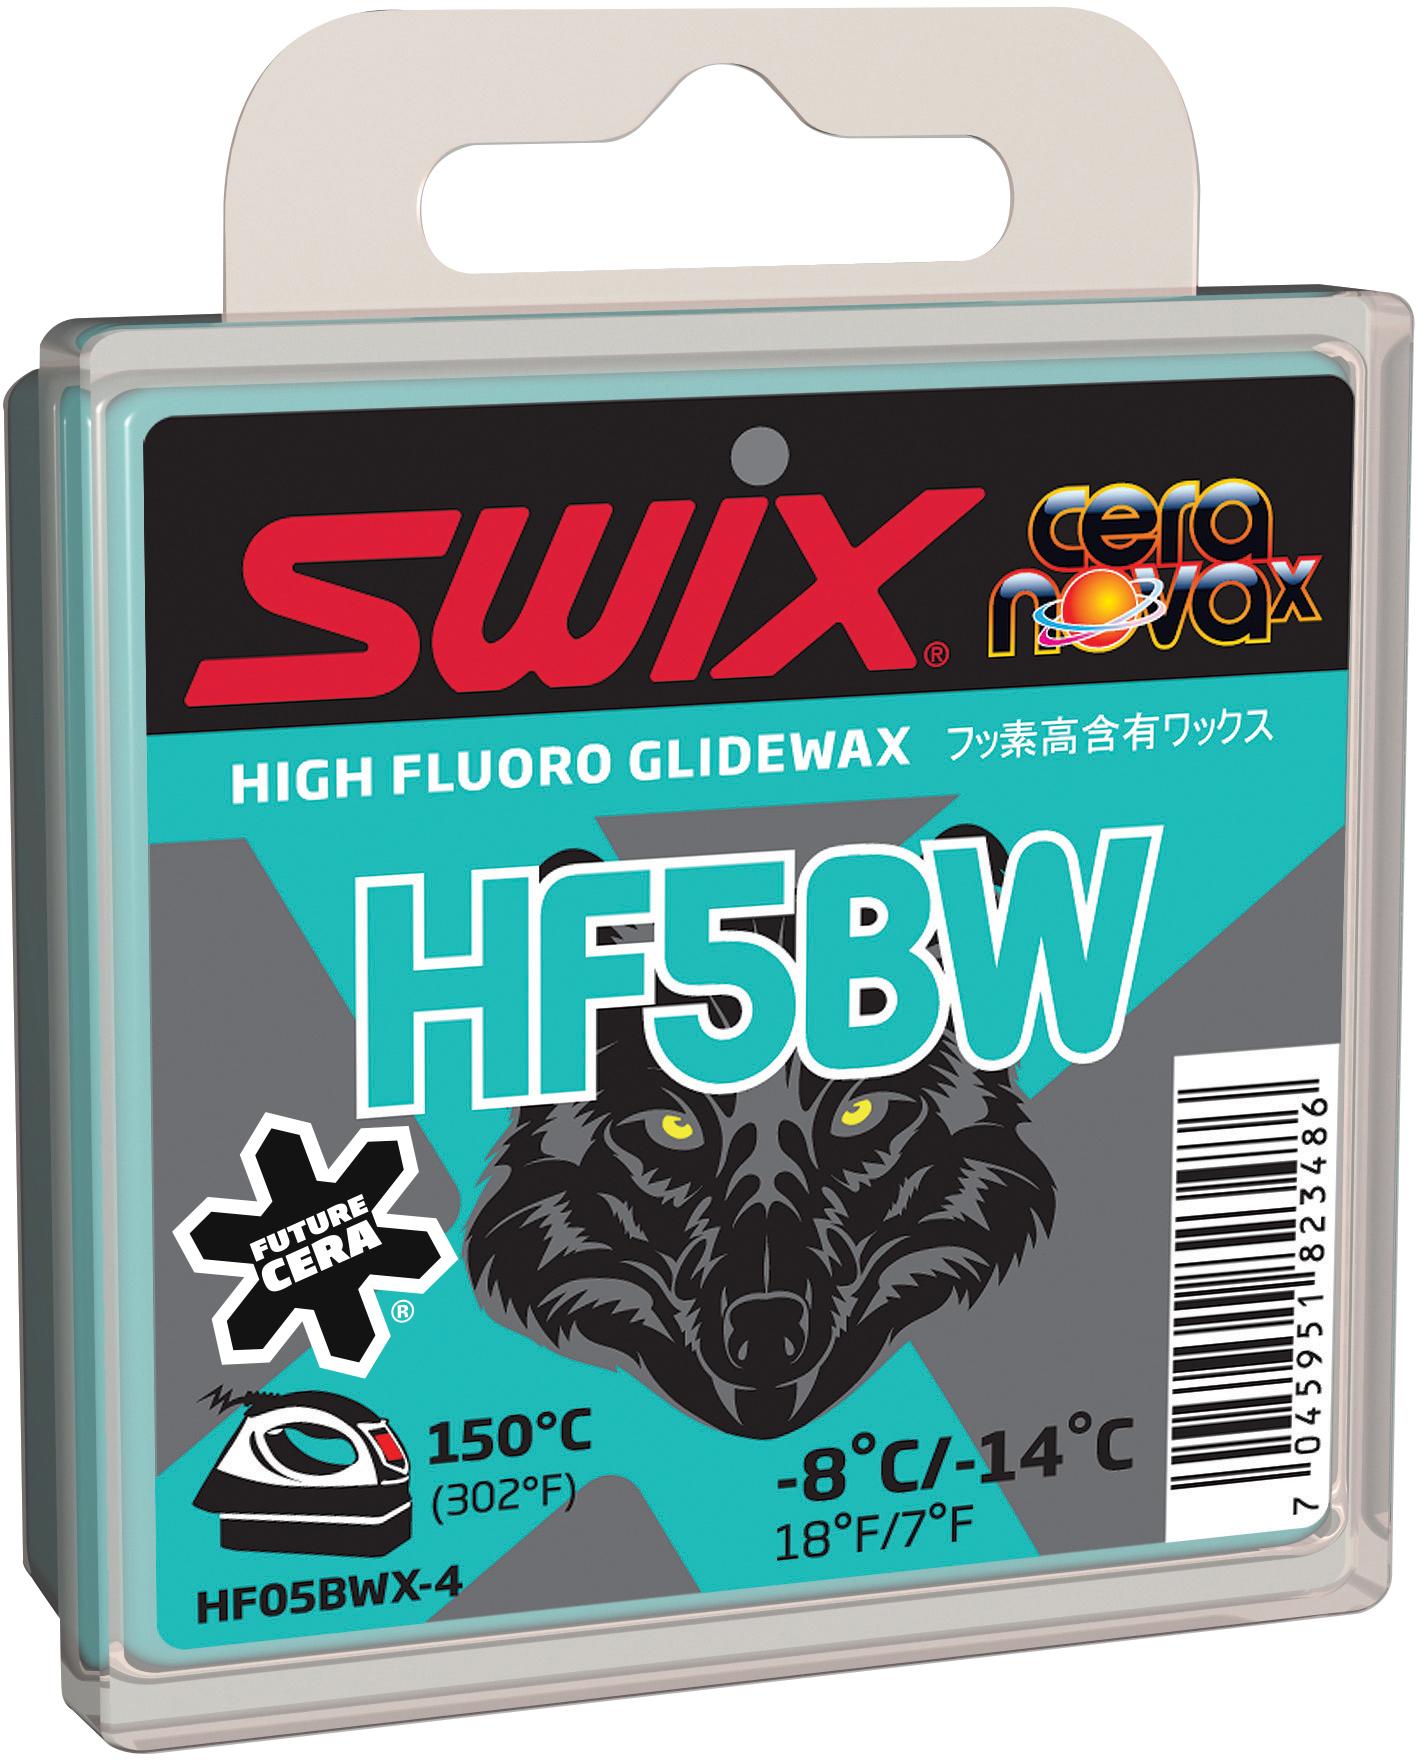 Swix Мазь скольжения Swix, -8C / -14C утюг походный swix t0066